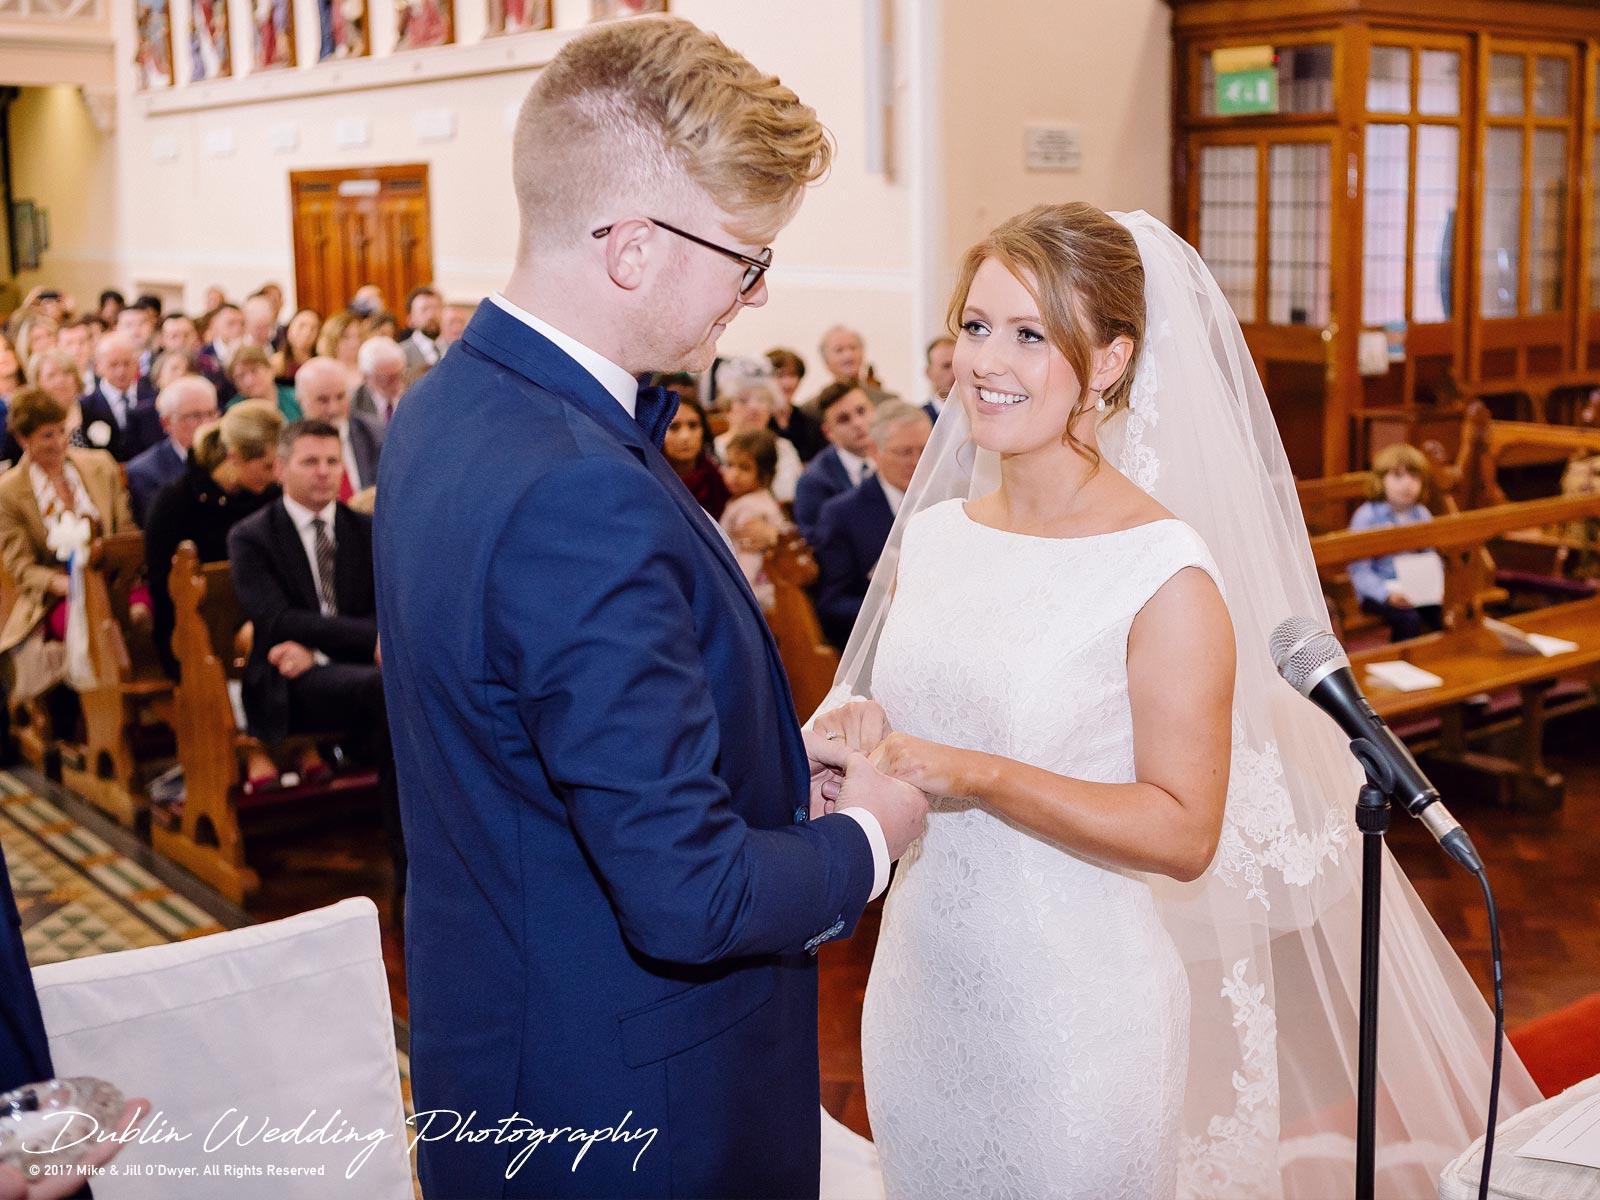 037_AislingAlan_1600x1200.jpgTinakilly House Wedding Photographer: Bride & Groom Looking At Each Other